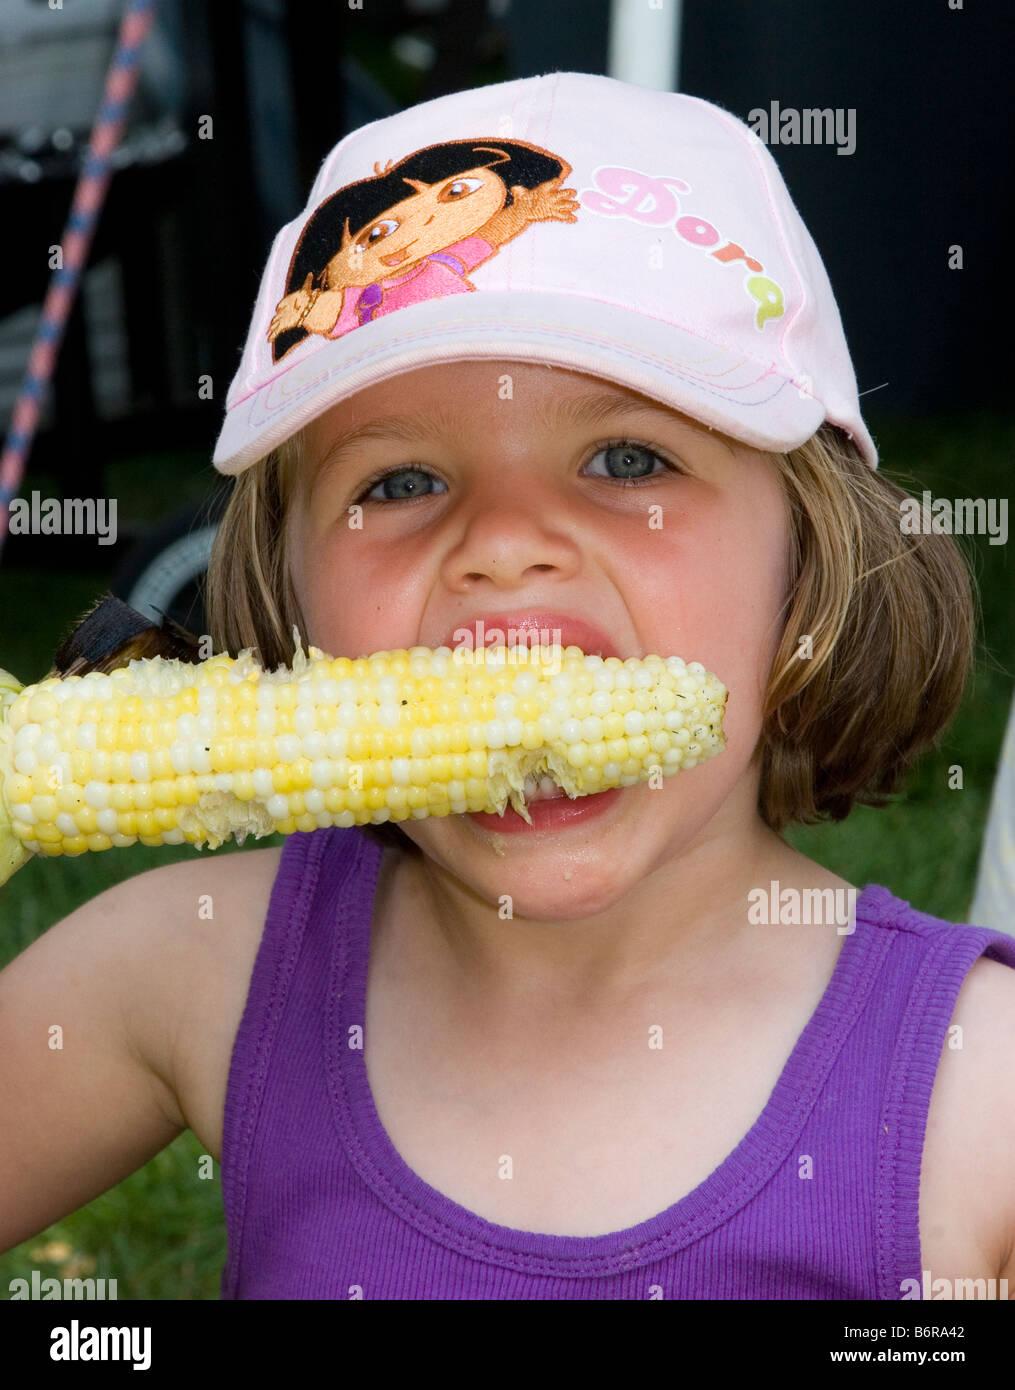 Young girl eats corn on the cob - Stock Image